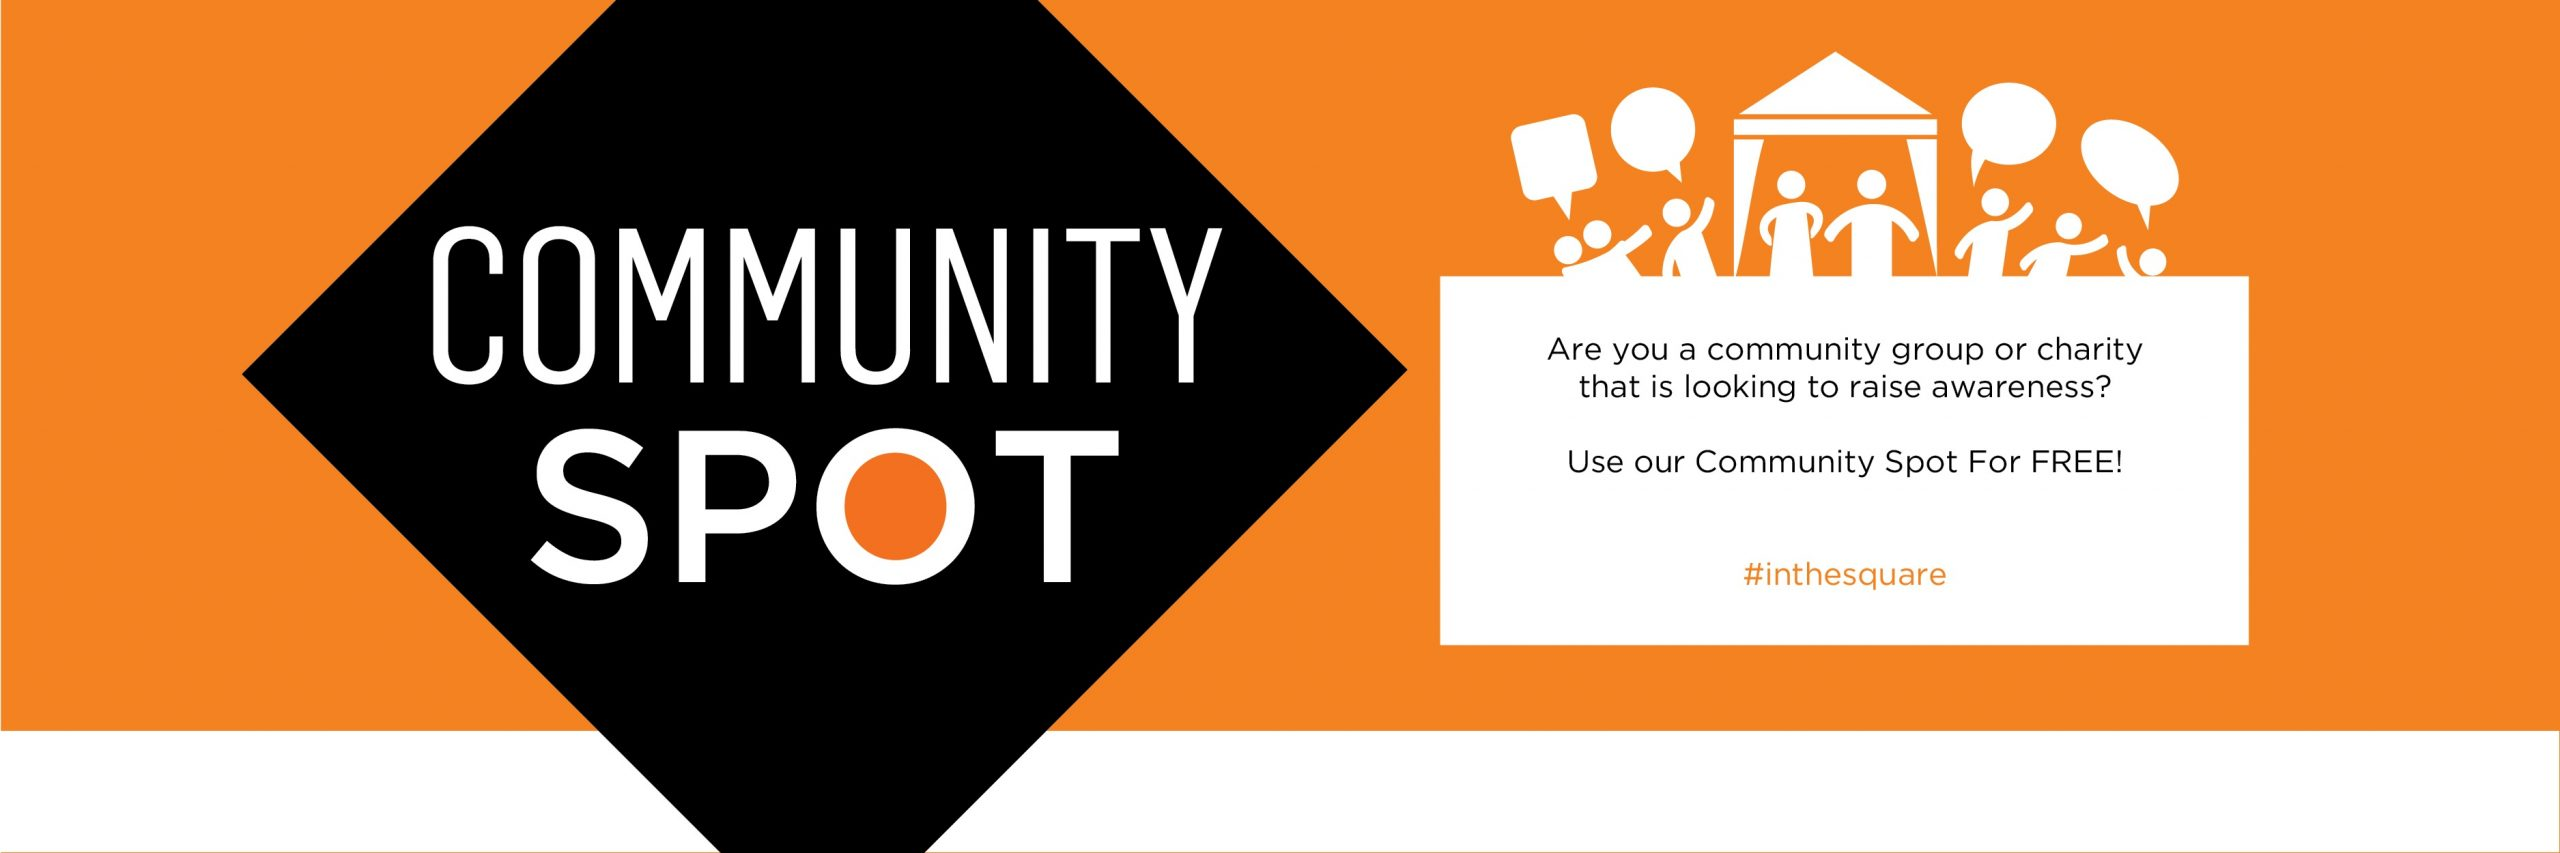 Community Spot